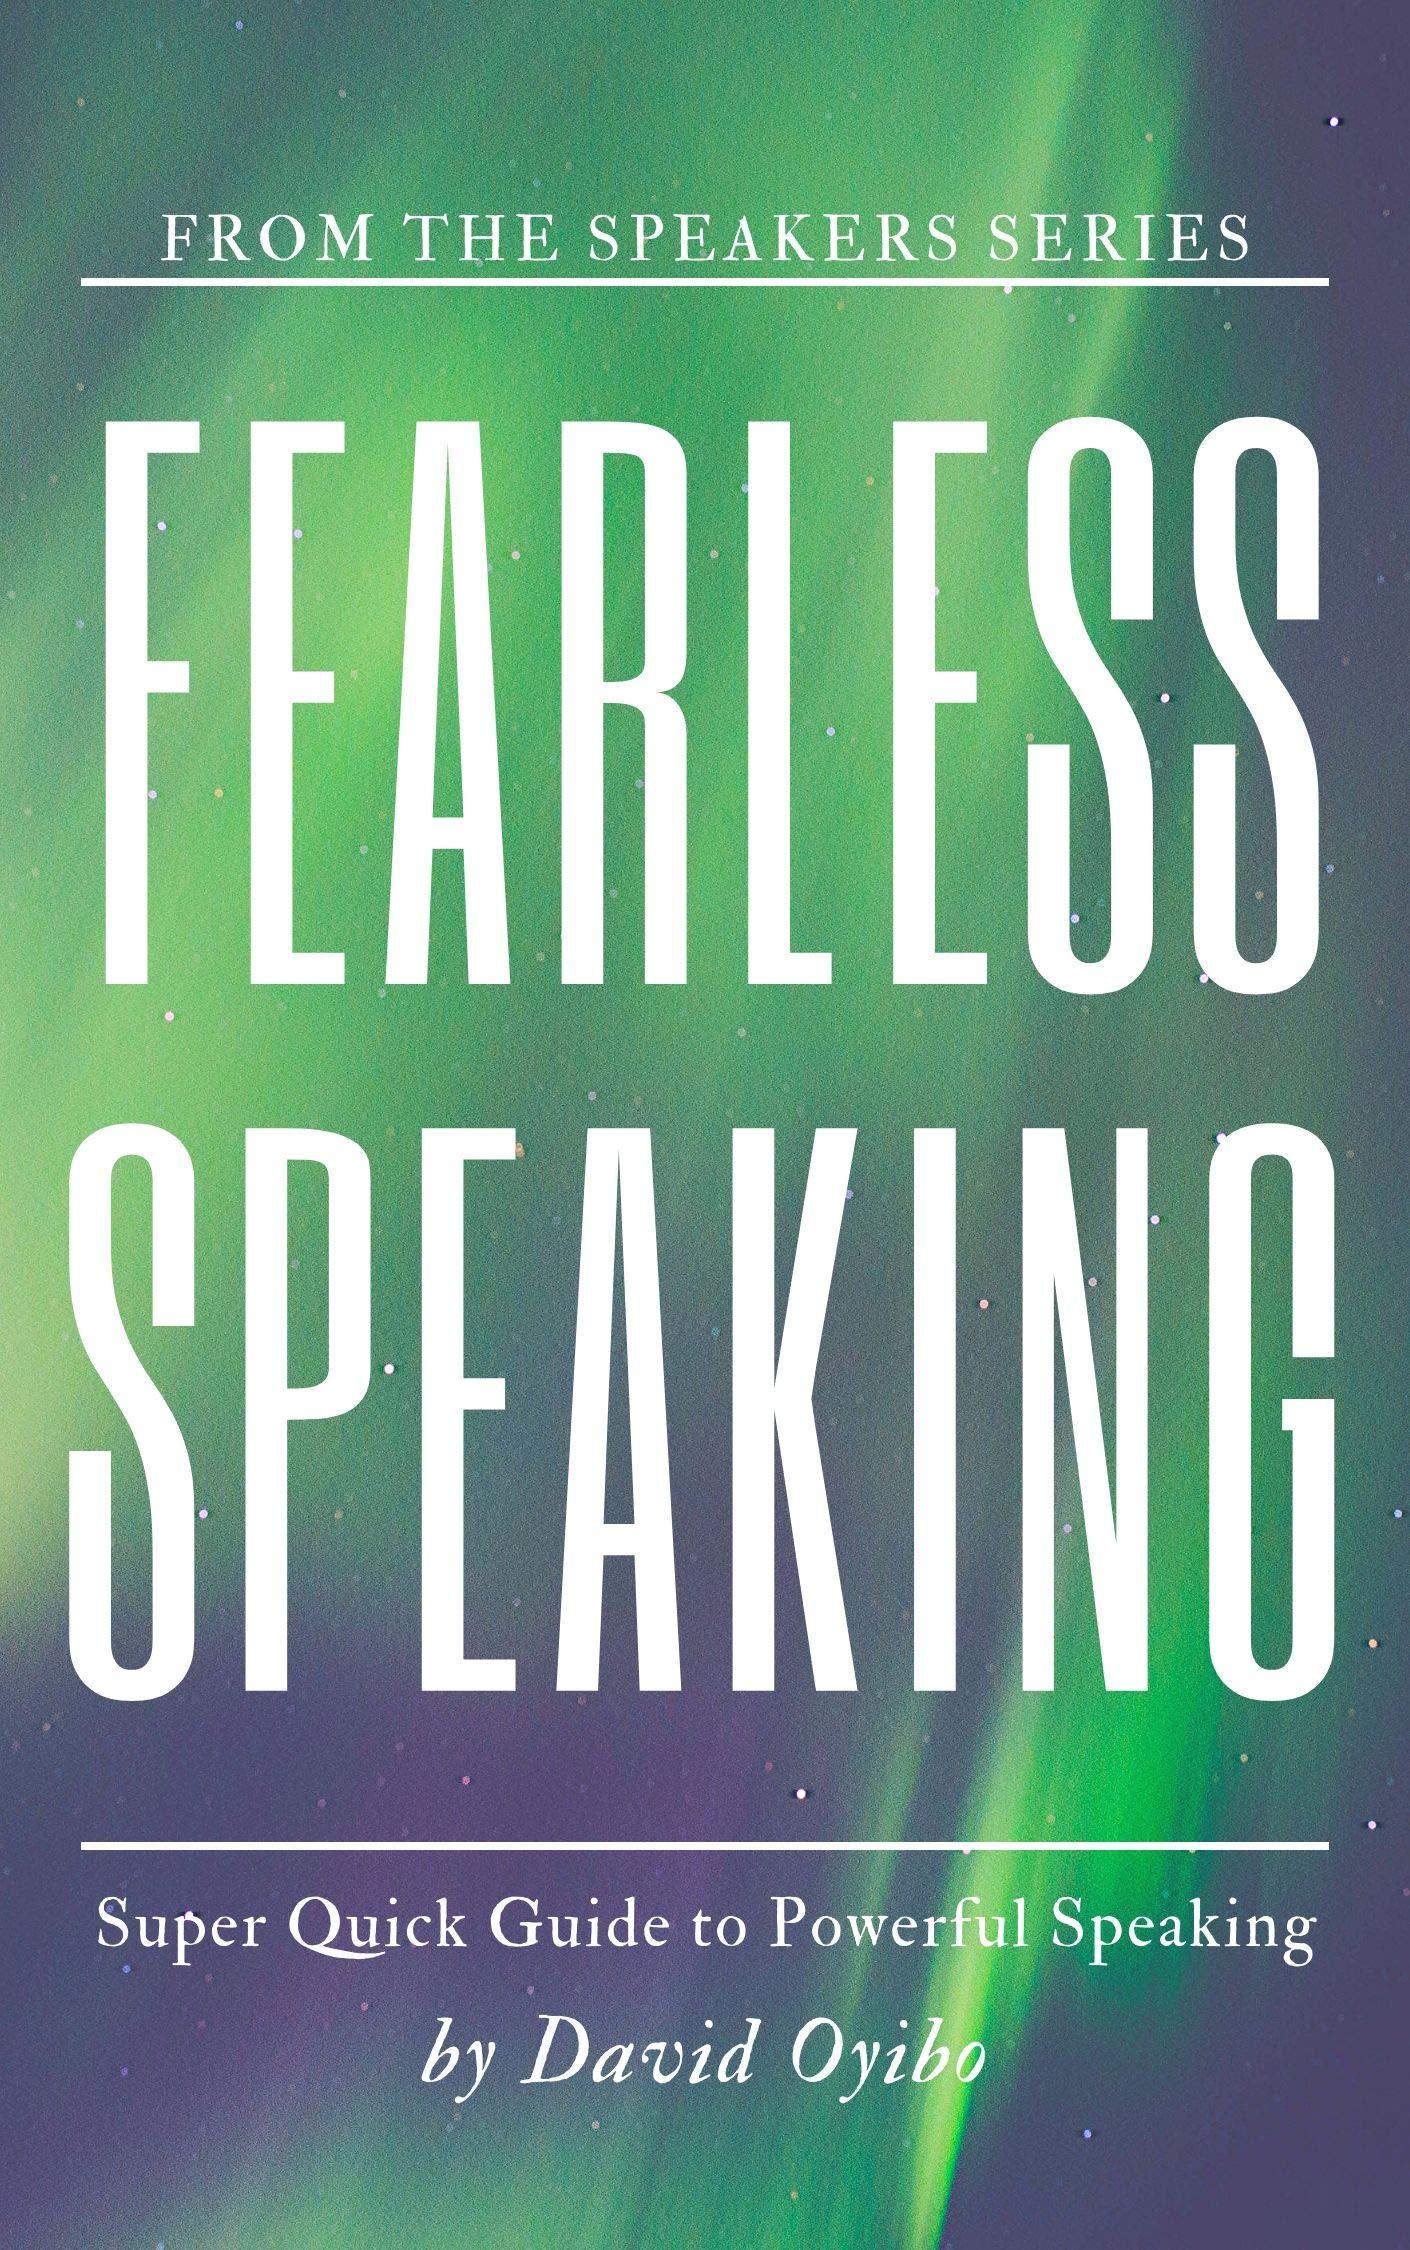 Fearless Speaking: Super Quick Guide to Powerful Speaking (Speaker Series)